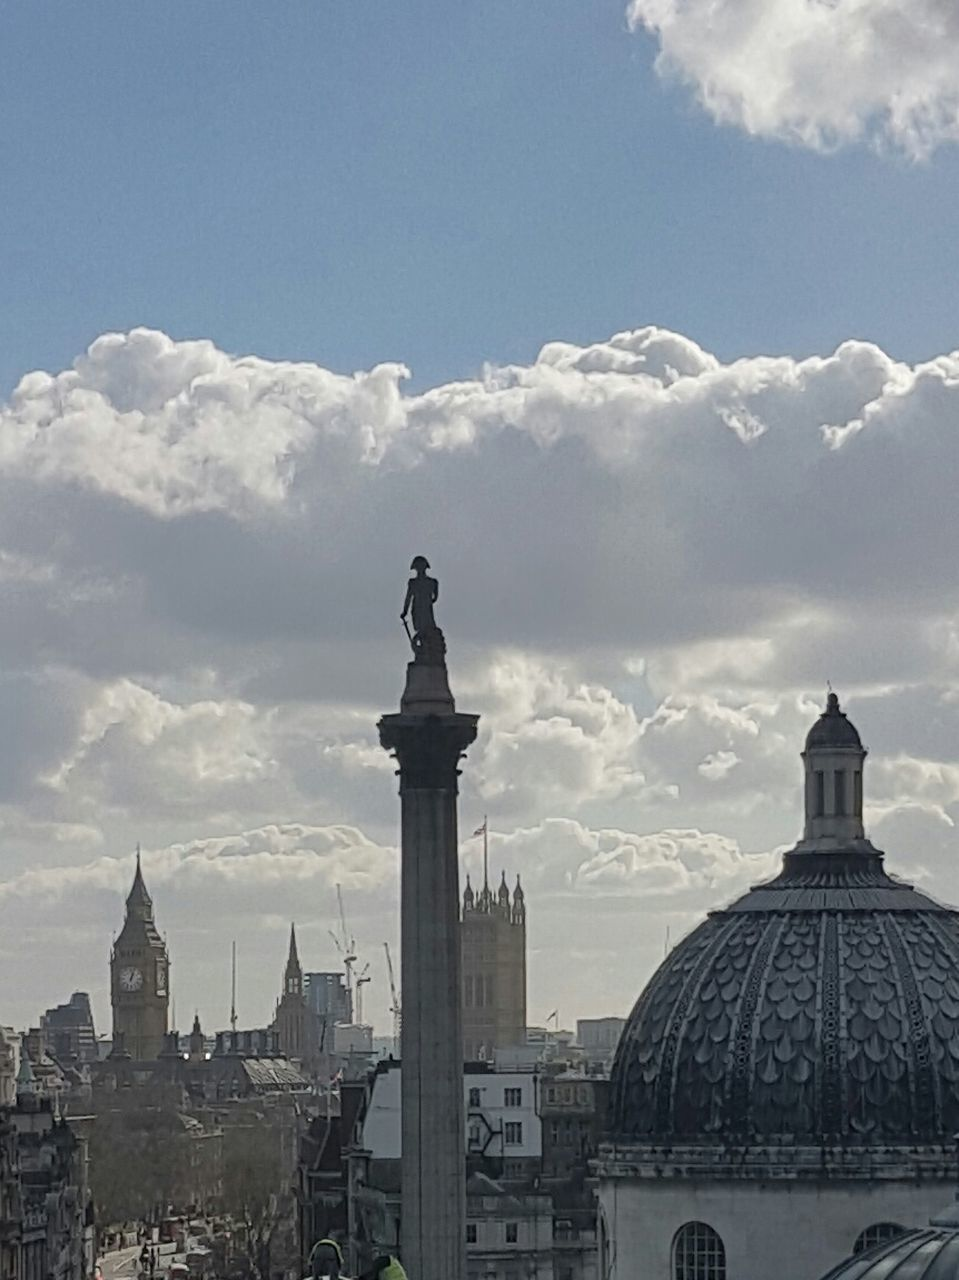 statue, human representation, sculpture, cloud - sky, sky, architecture, built structure, building exterior, no people, outdoors, day, city, travel destinations, cityscape